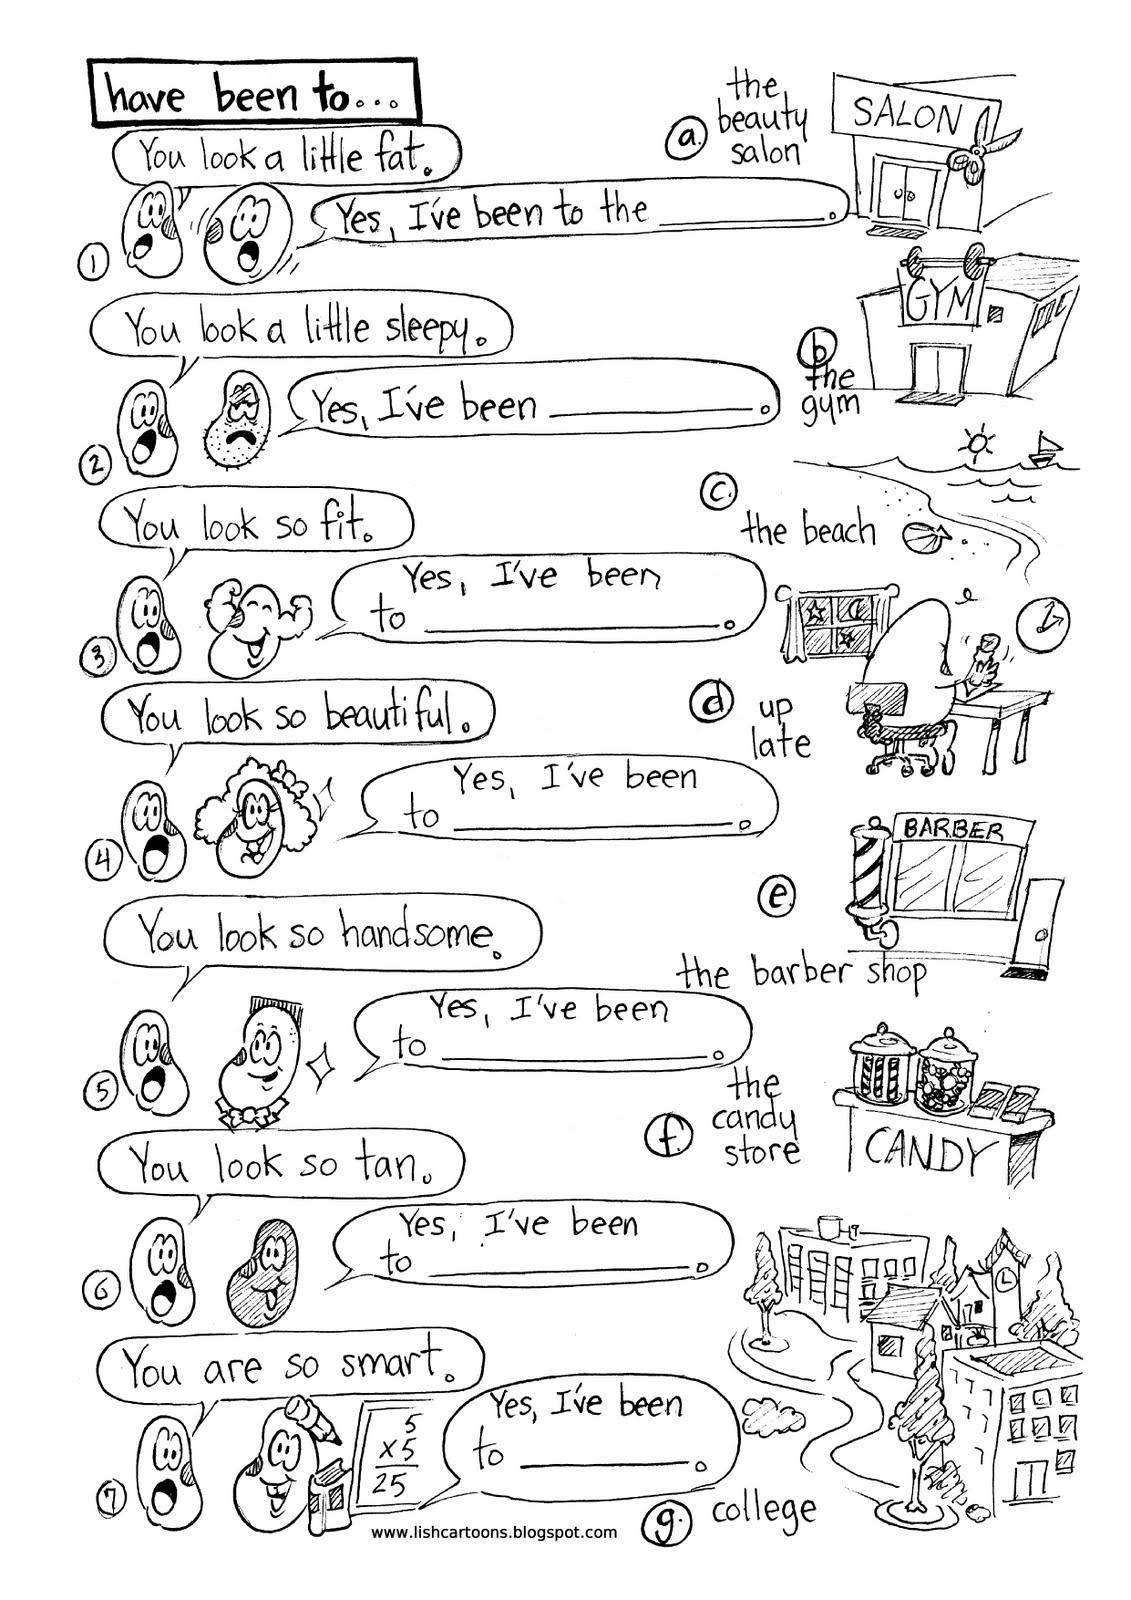 Uncategorized Feelings Worksheets worksheet emotions fiercebad and essay site expressing expressyourfeelingsworksheets express your feelings worksheets http